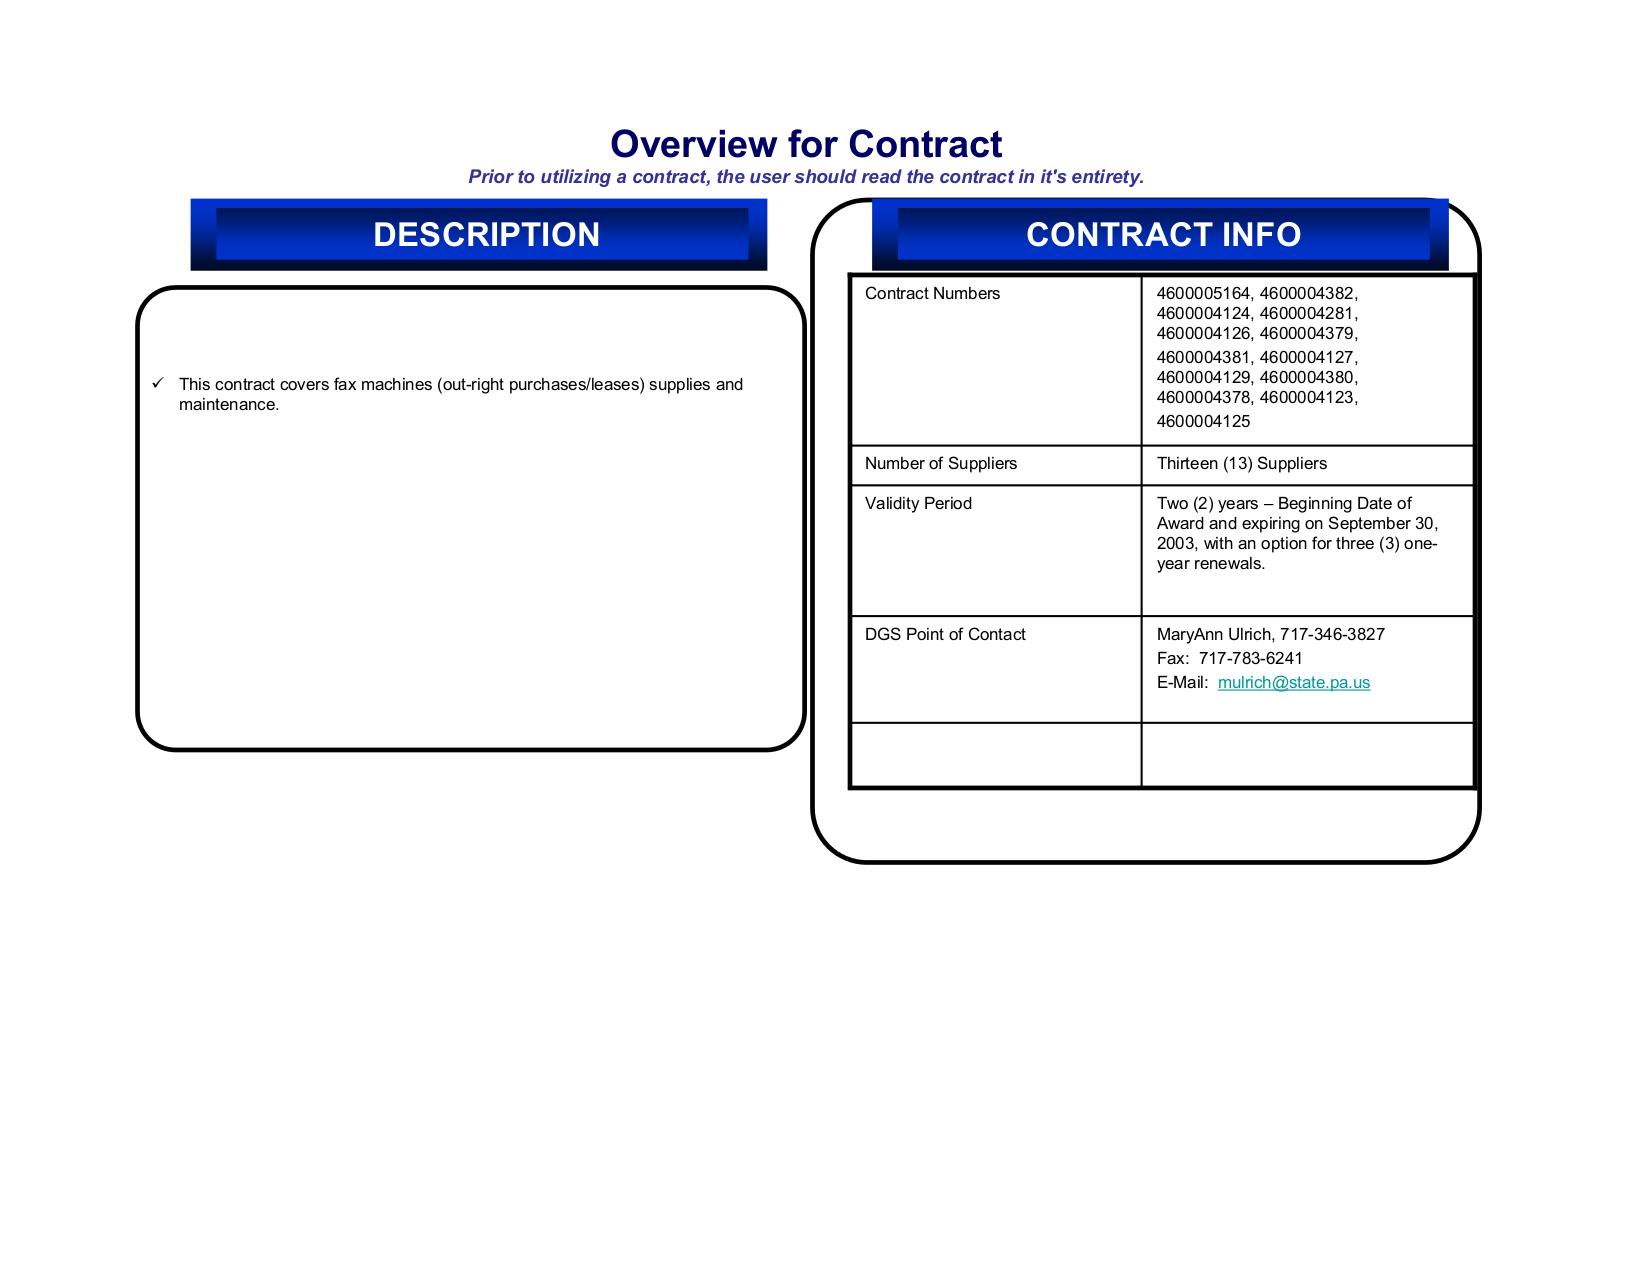 pdf for Ricoh Fax Machine fax170 manual